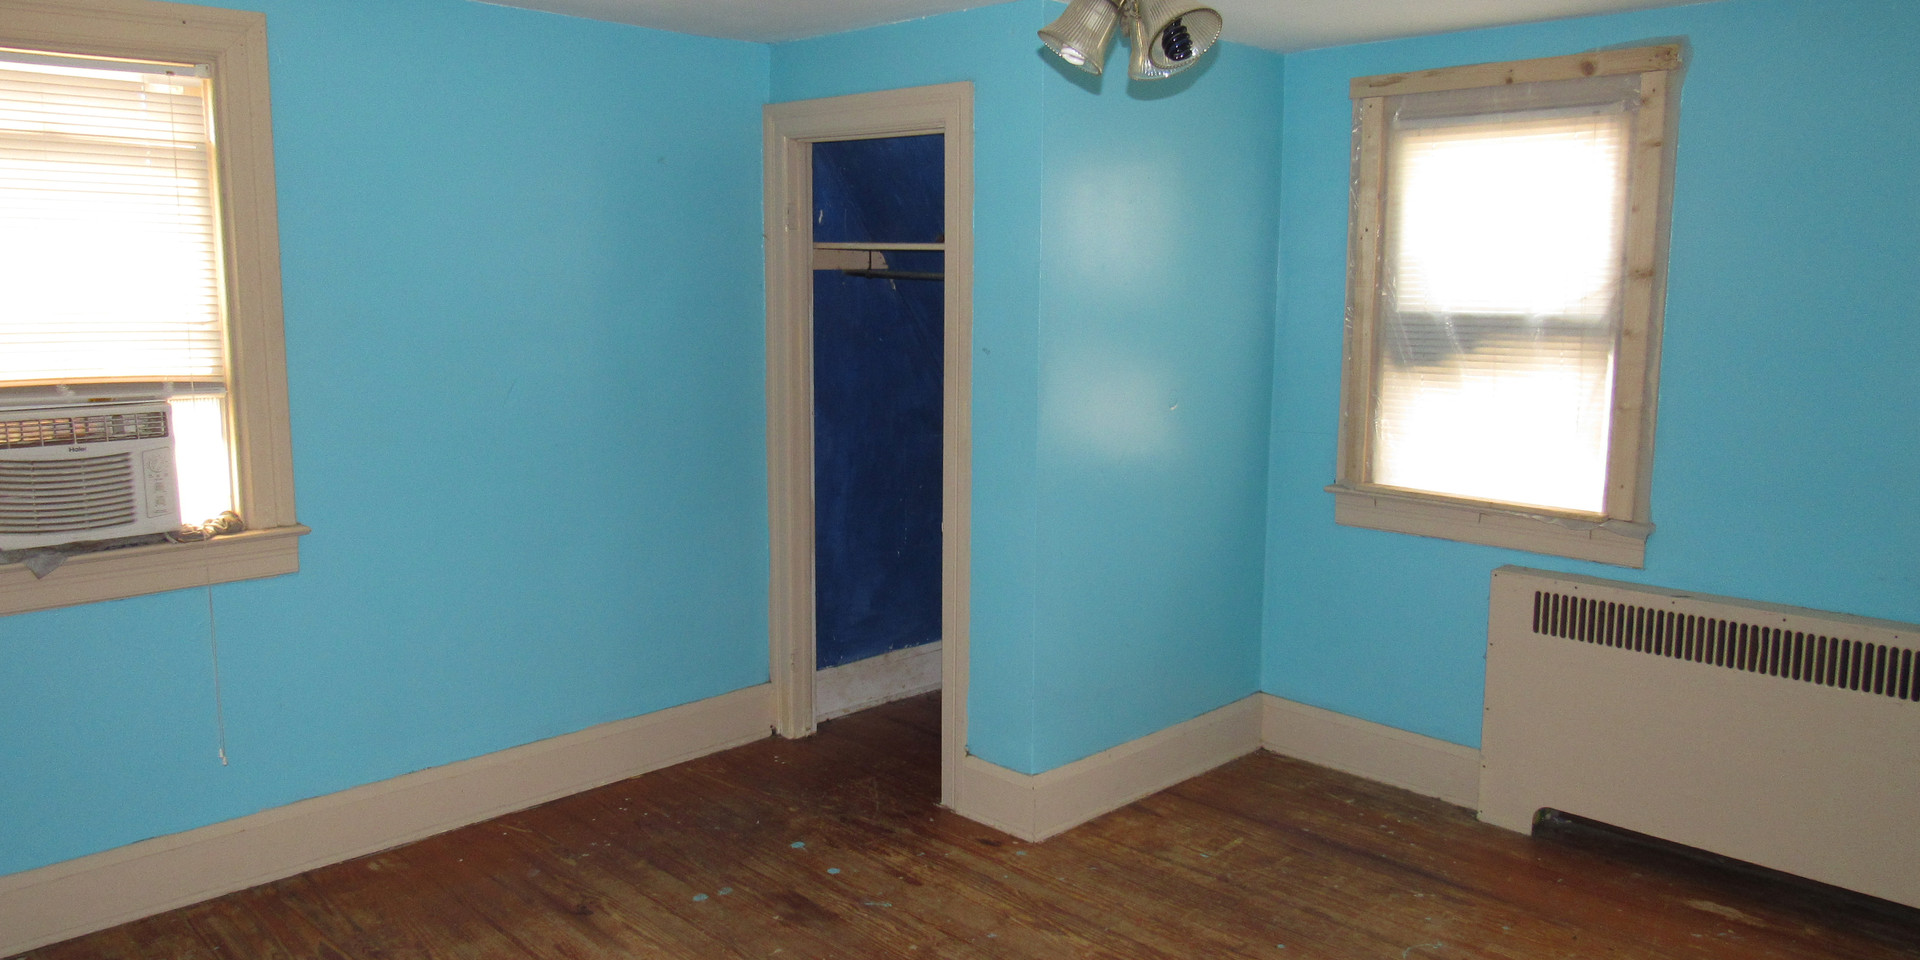 26 - Bedroom 2.JPG